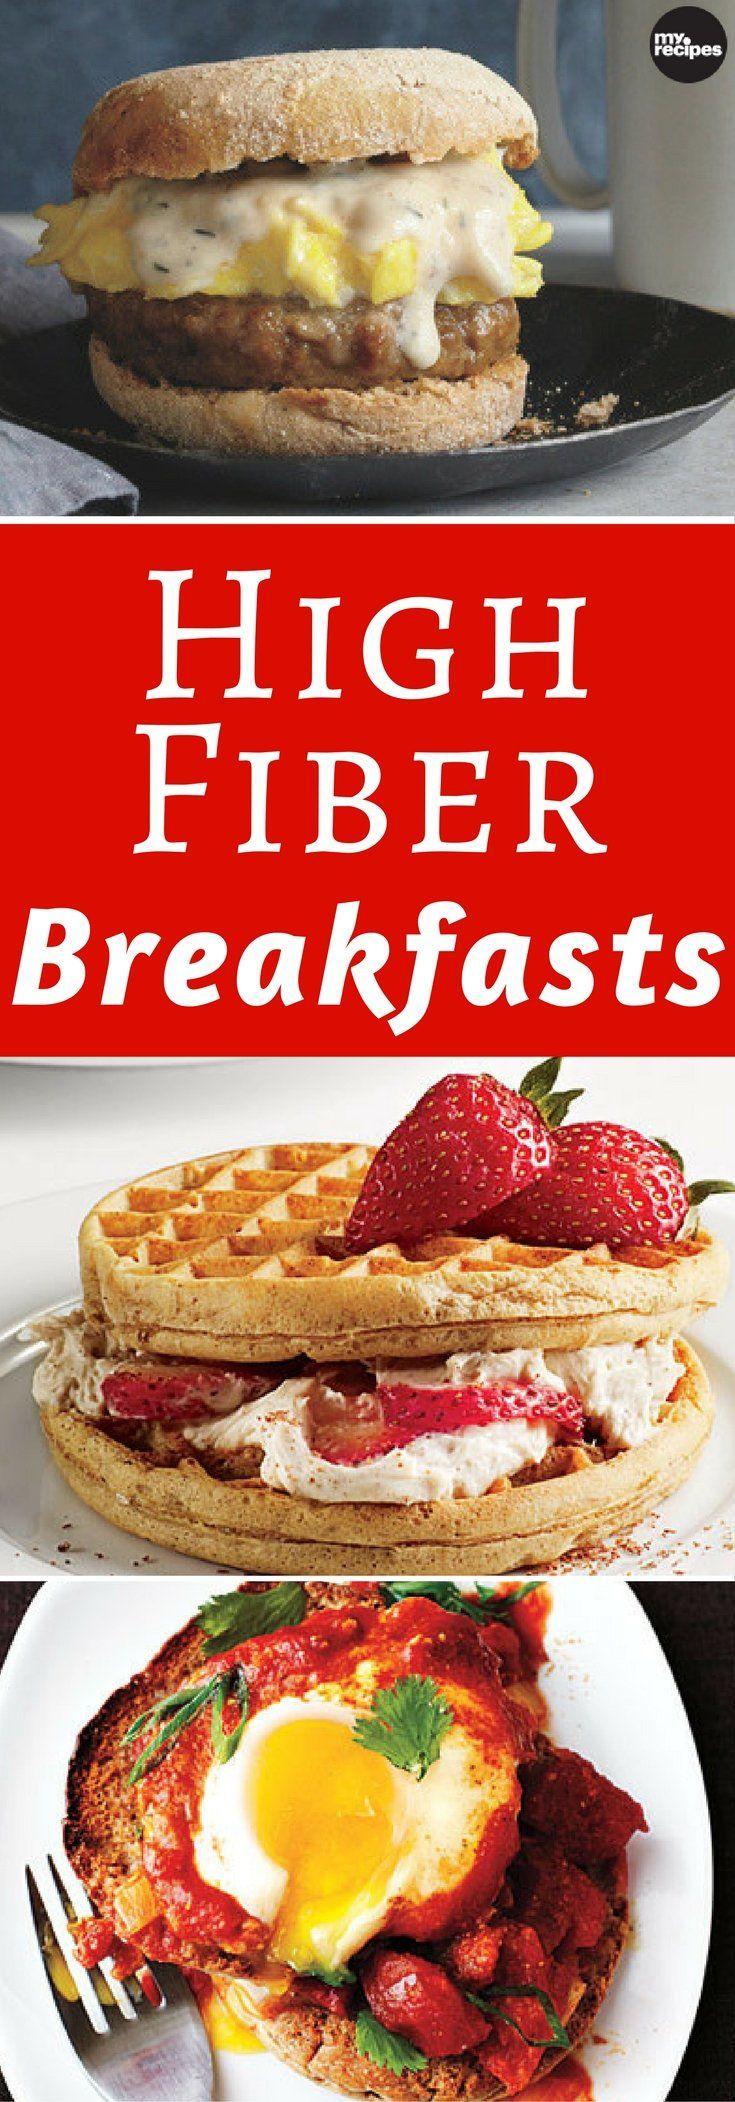 High Fiber Breakfast Recipe  366 best Breakfast and Brunch images on Pinterest